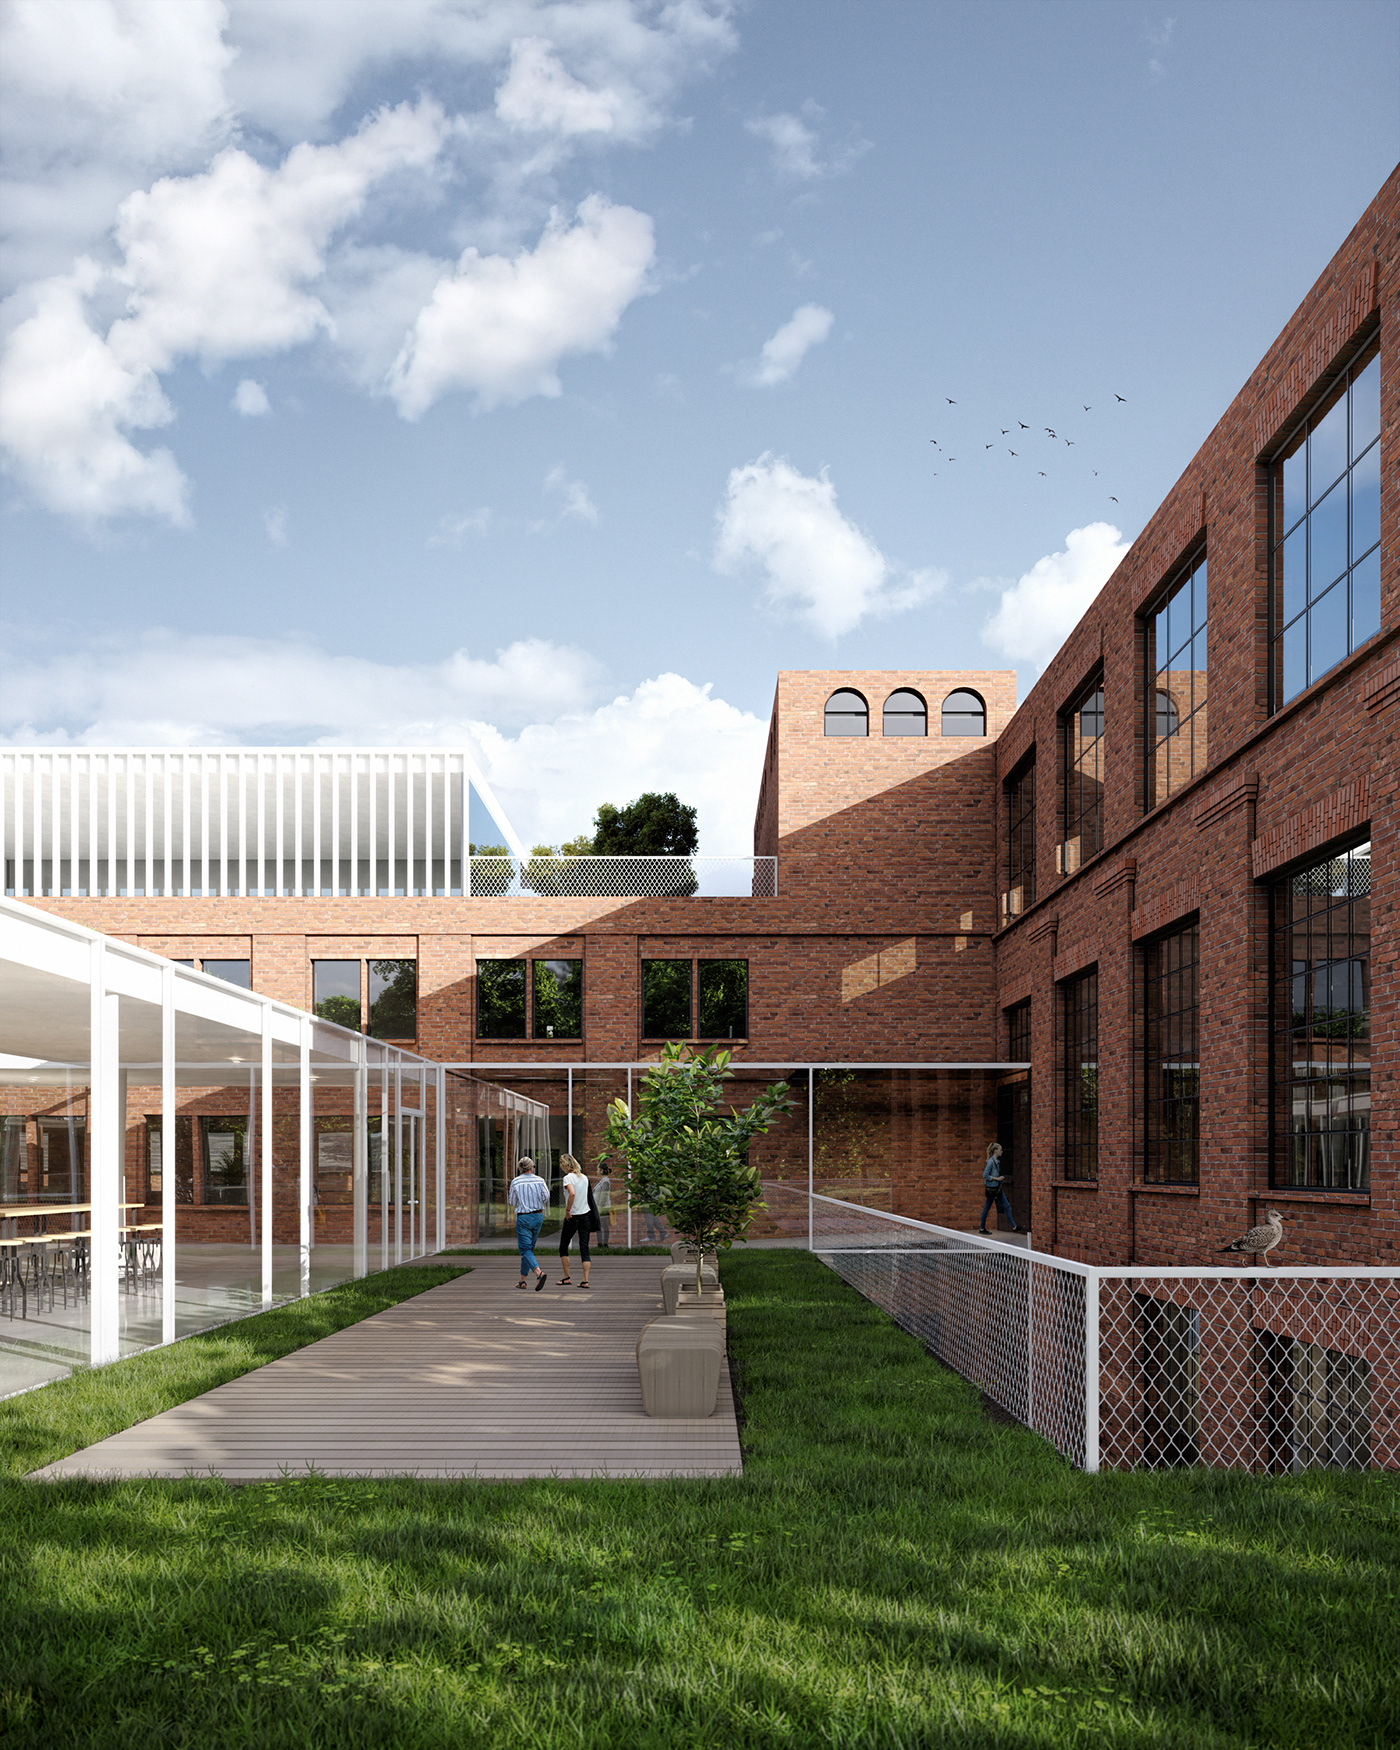 adaptive reuse architecture cultural culture exhibition space Gdansk Gradutaion project masters degree revitalization school of arts